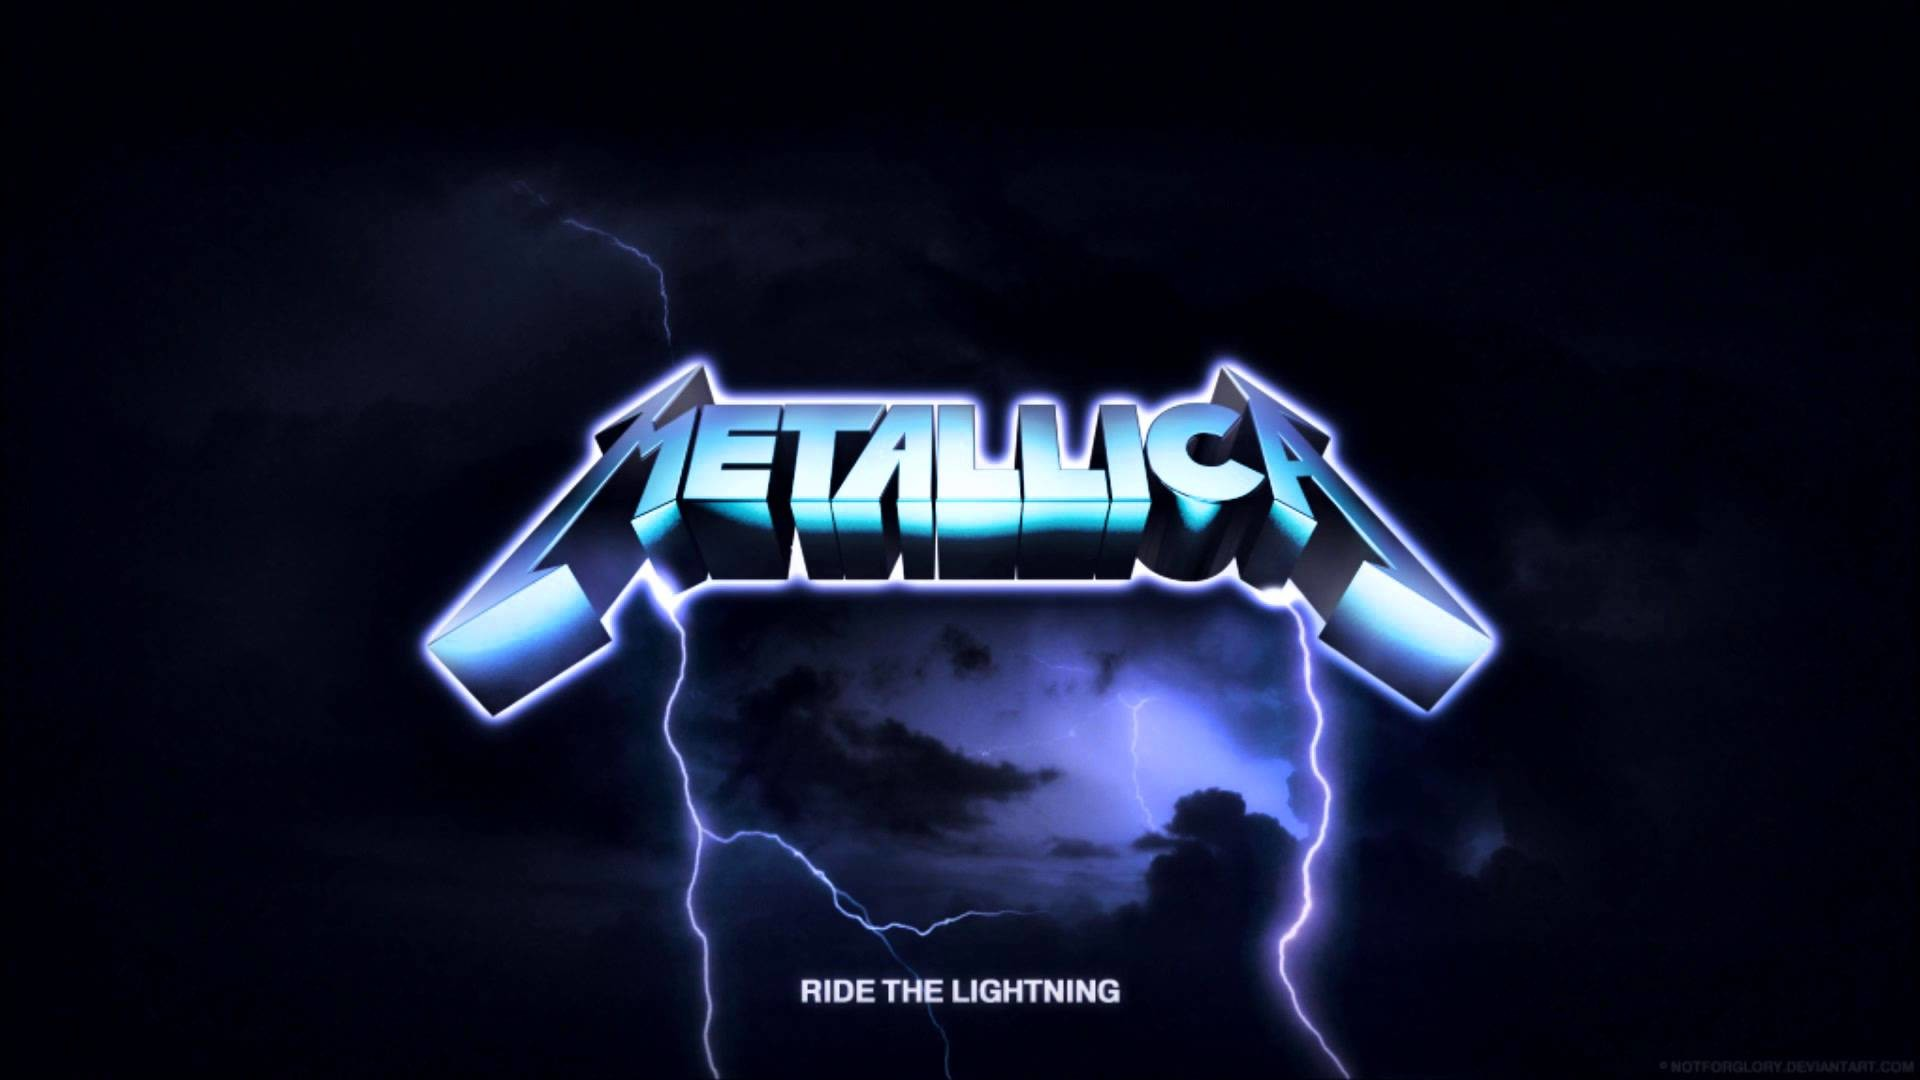 Metallica ride the lightning wallpaper 62 images - Metallica wallpaper ...